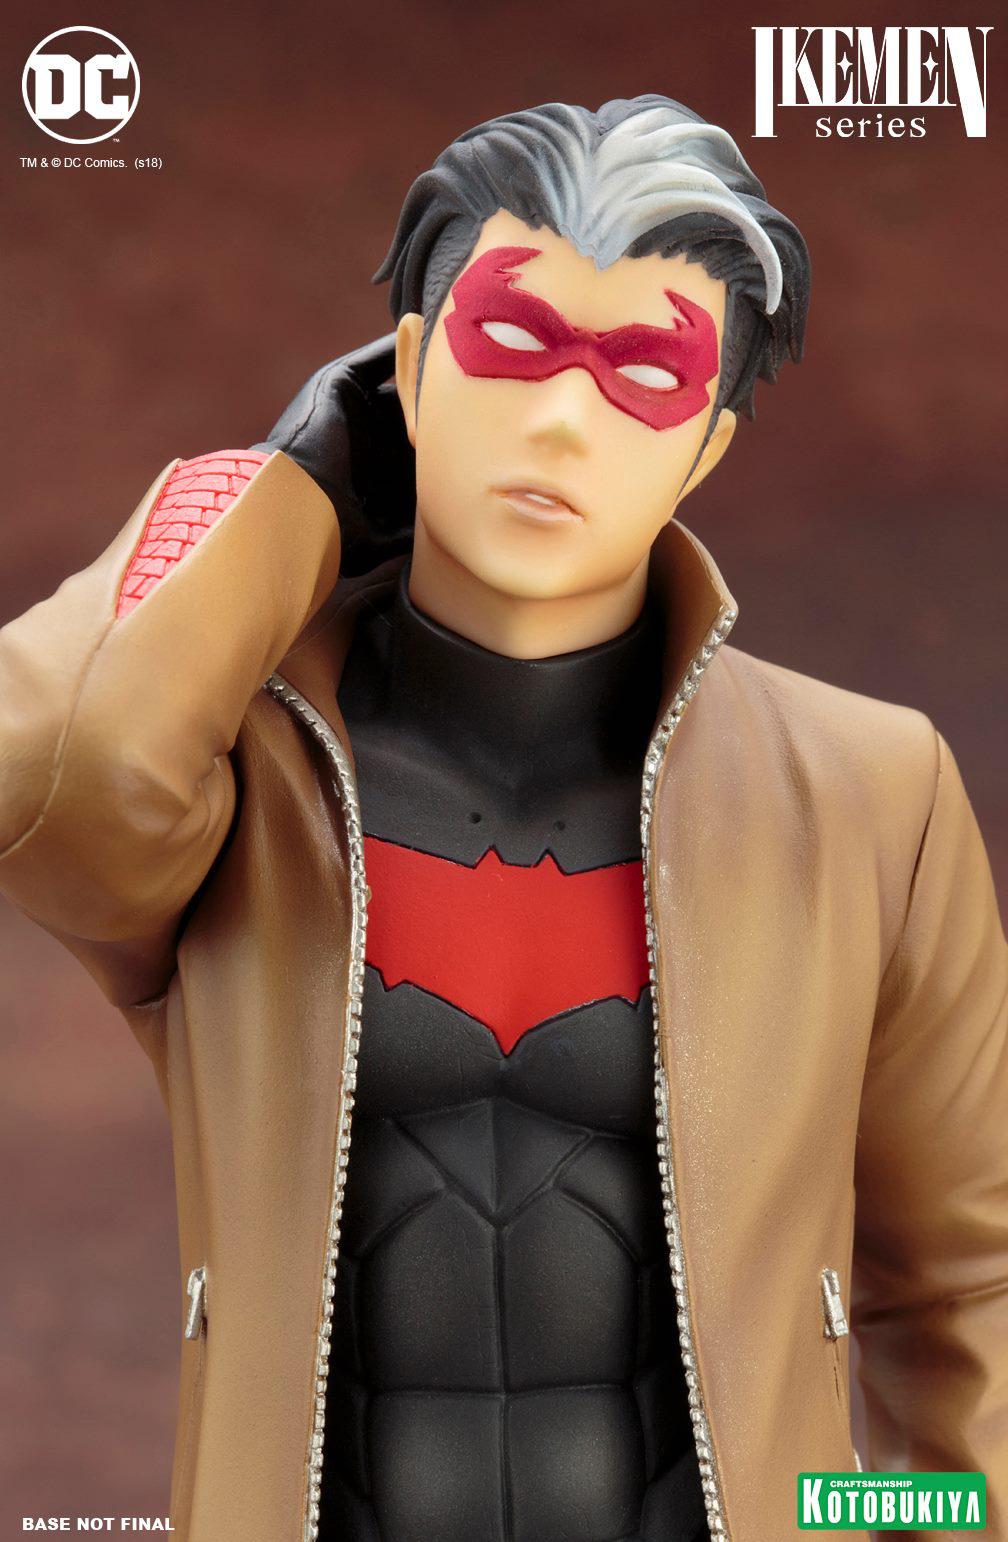 kotobukiya-dc-comics-red-hood-ikemen-statue-2